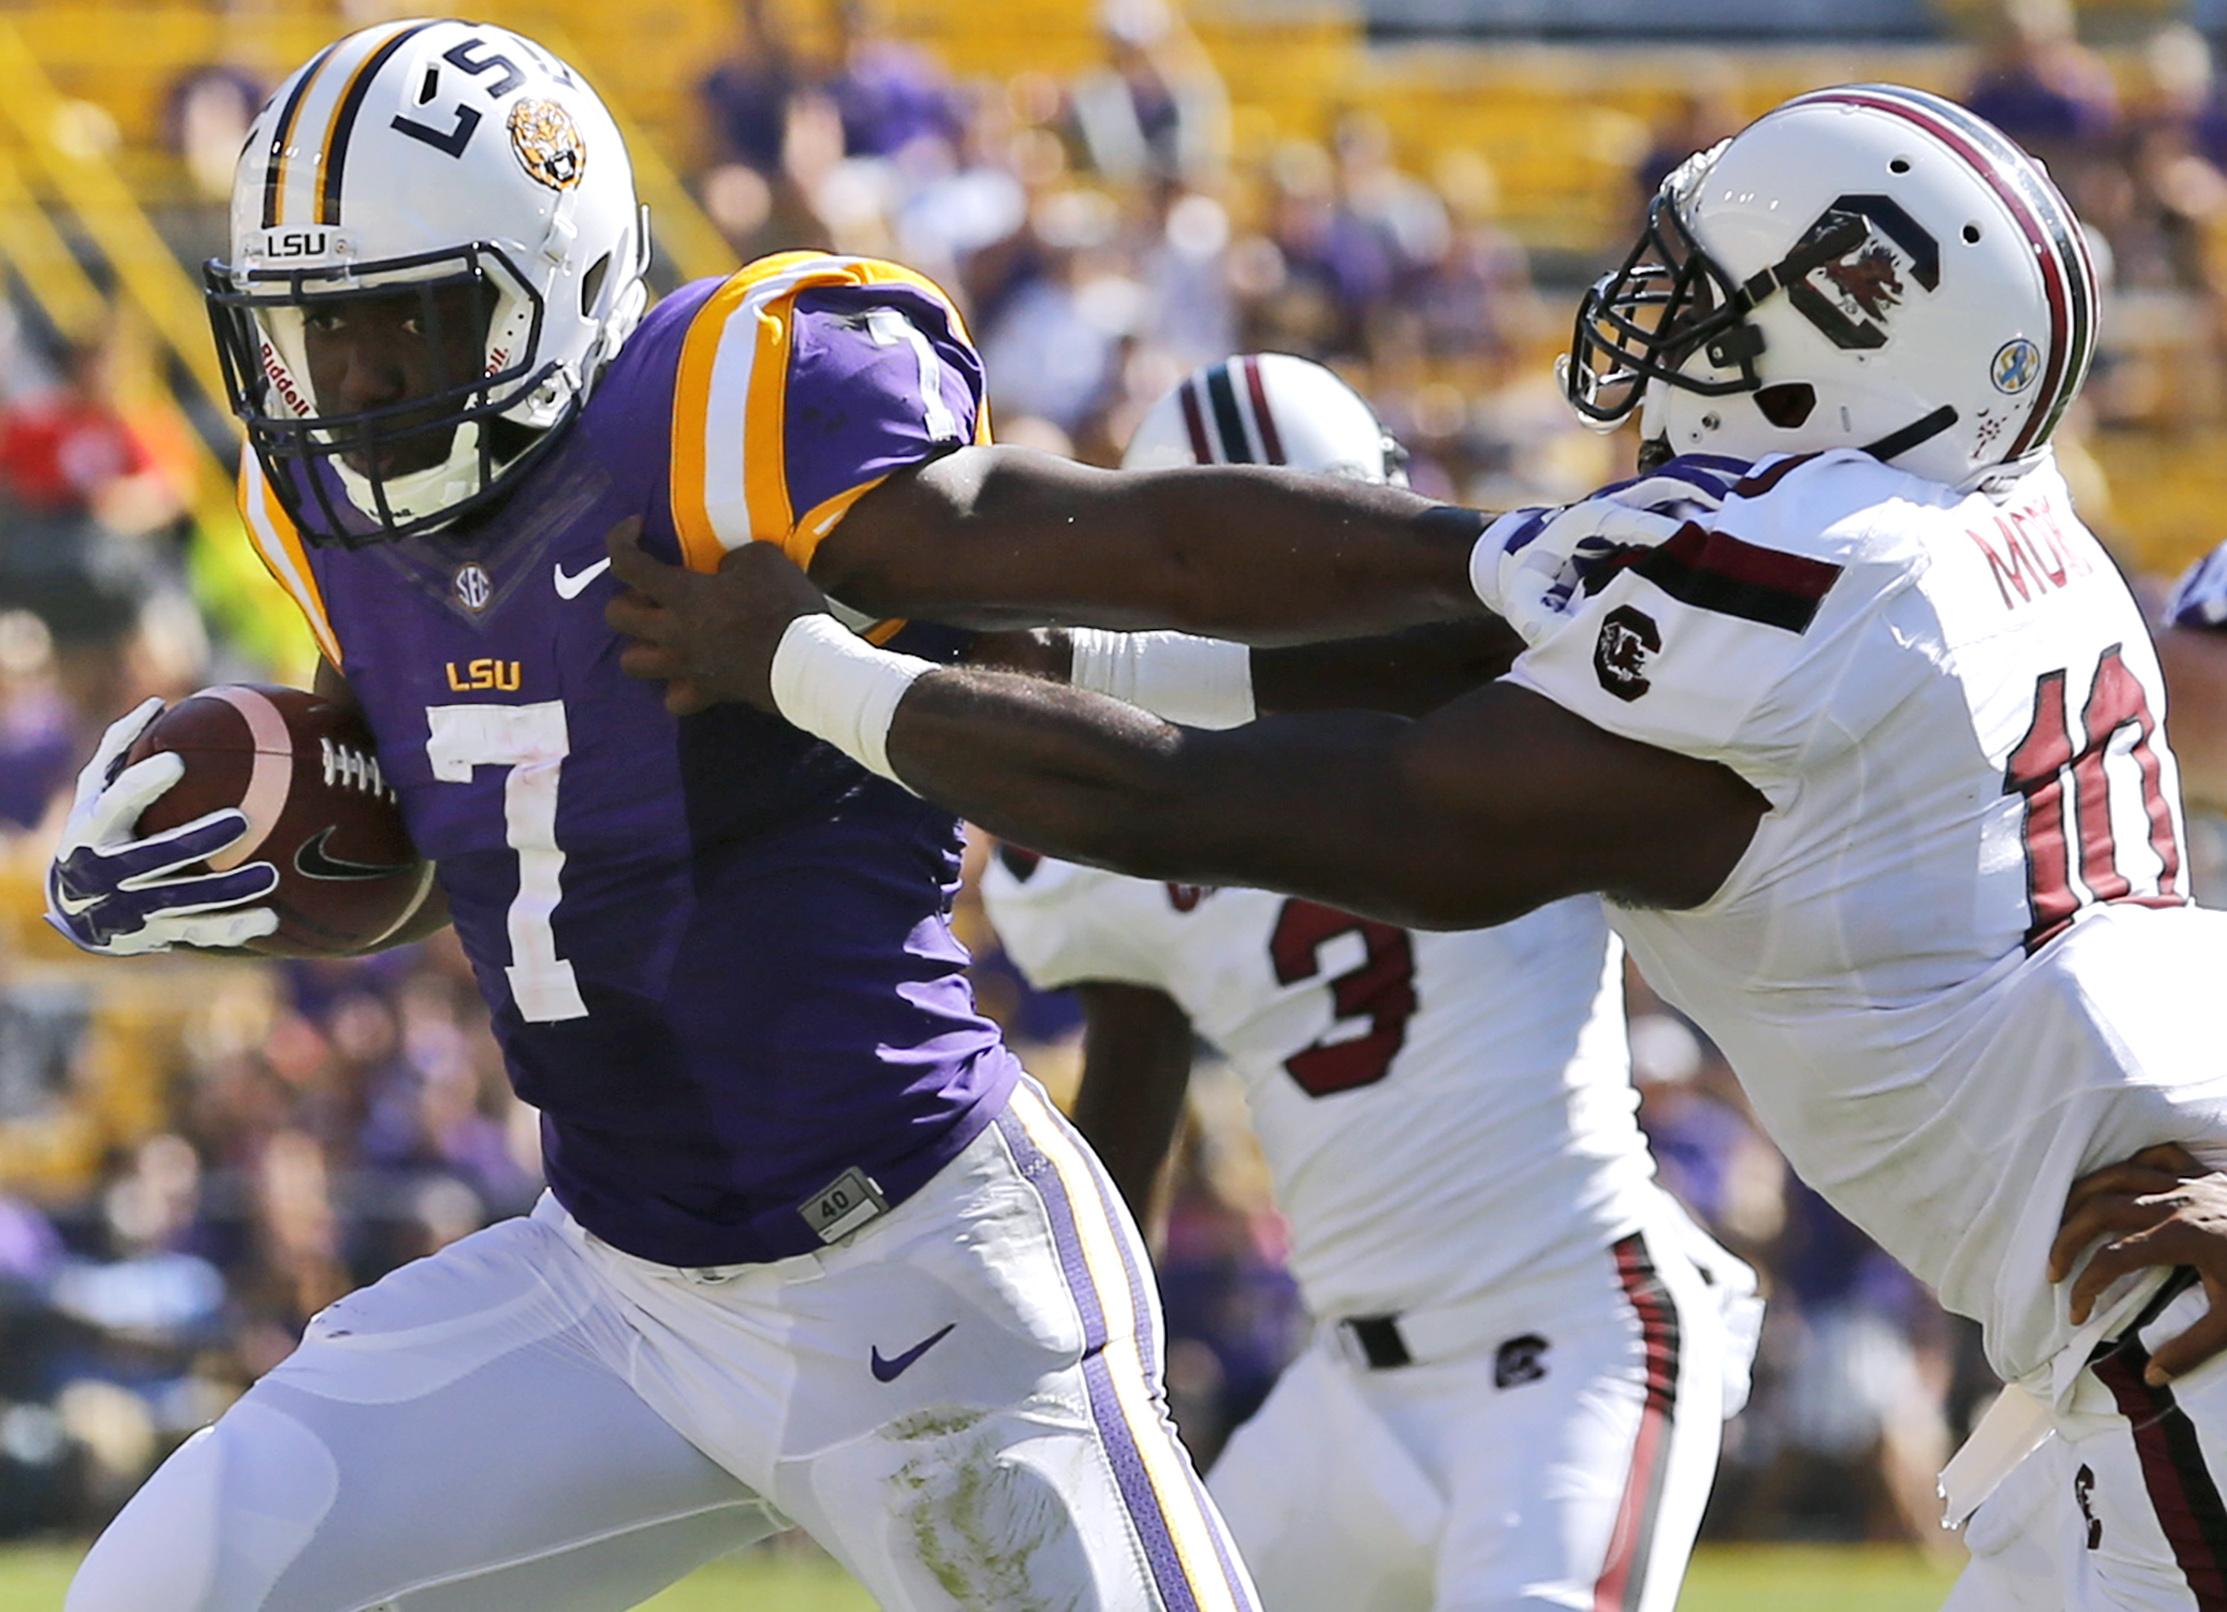 LSU running back Leonard Fournette (7) stiff arms South Carolina linebacker Skai Moore (10) during the first half of an NCAA college football game in Baton Rouge, La., Saturday, Oct. 10, 2015. (AP Photo/Jonathan Bachman)